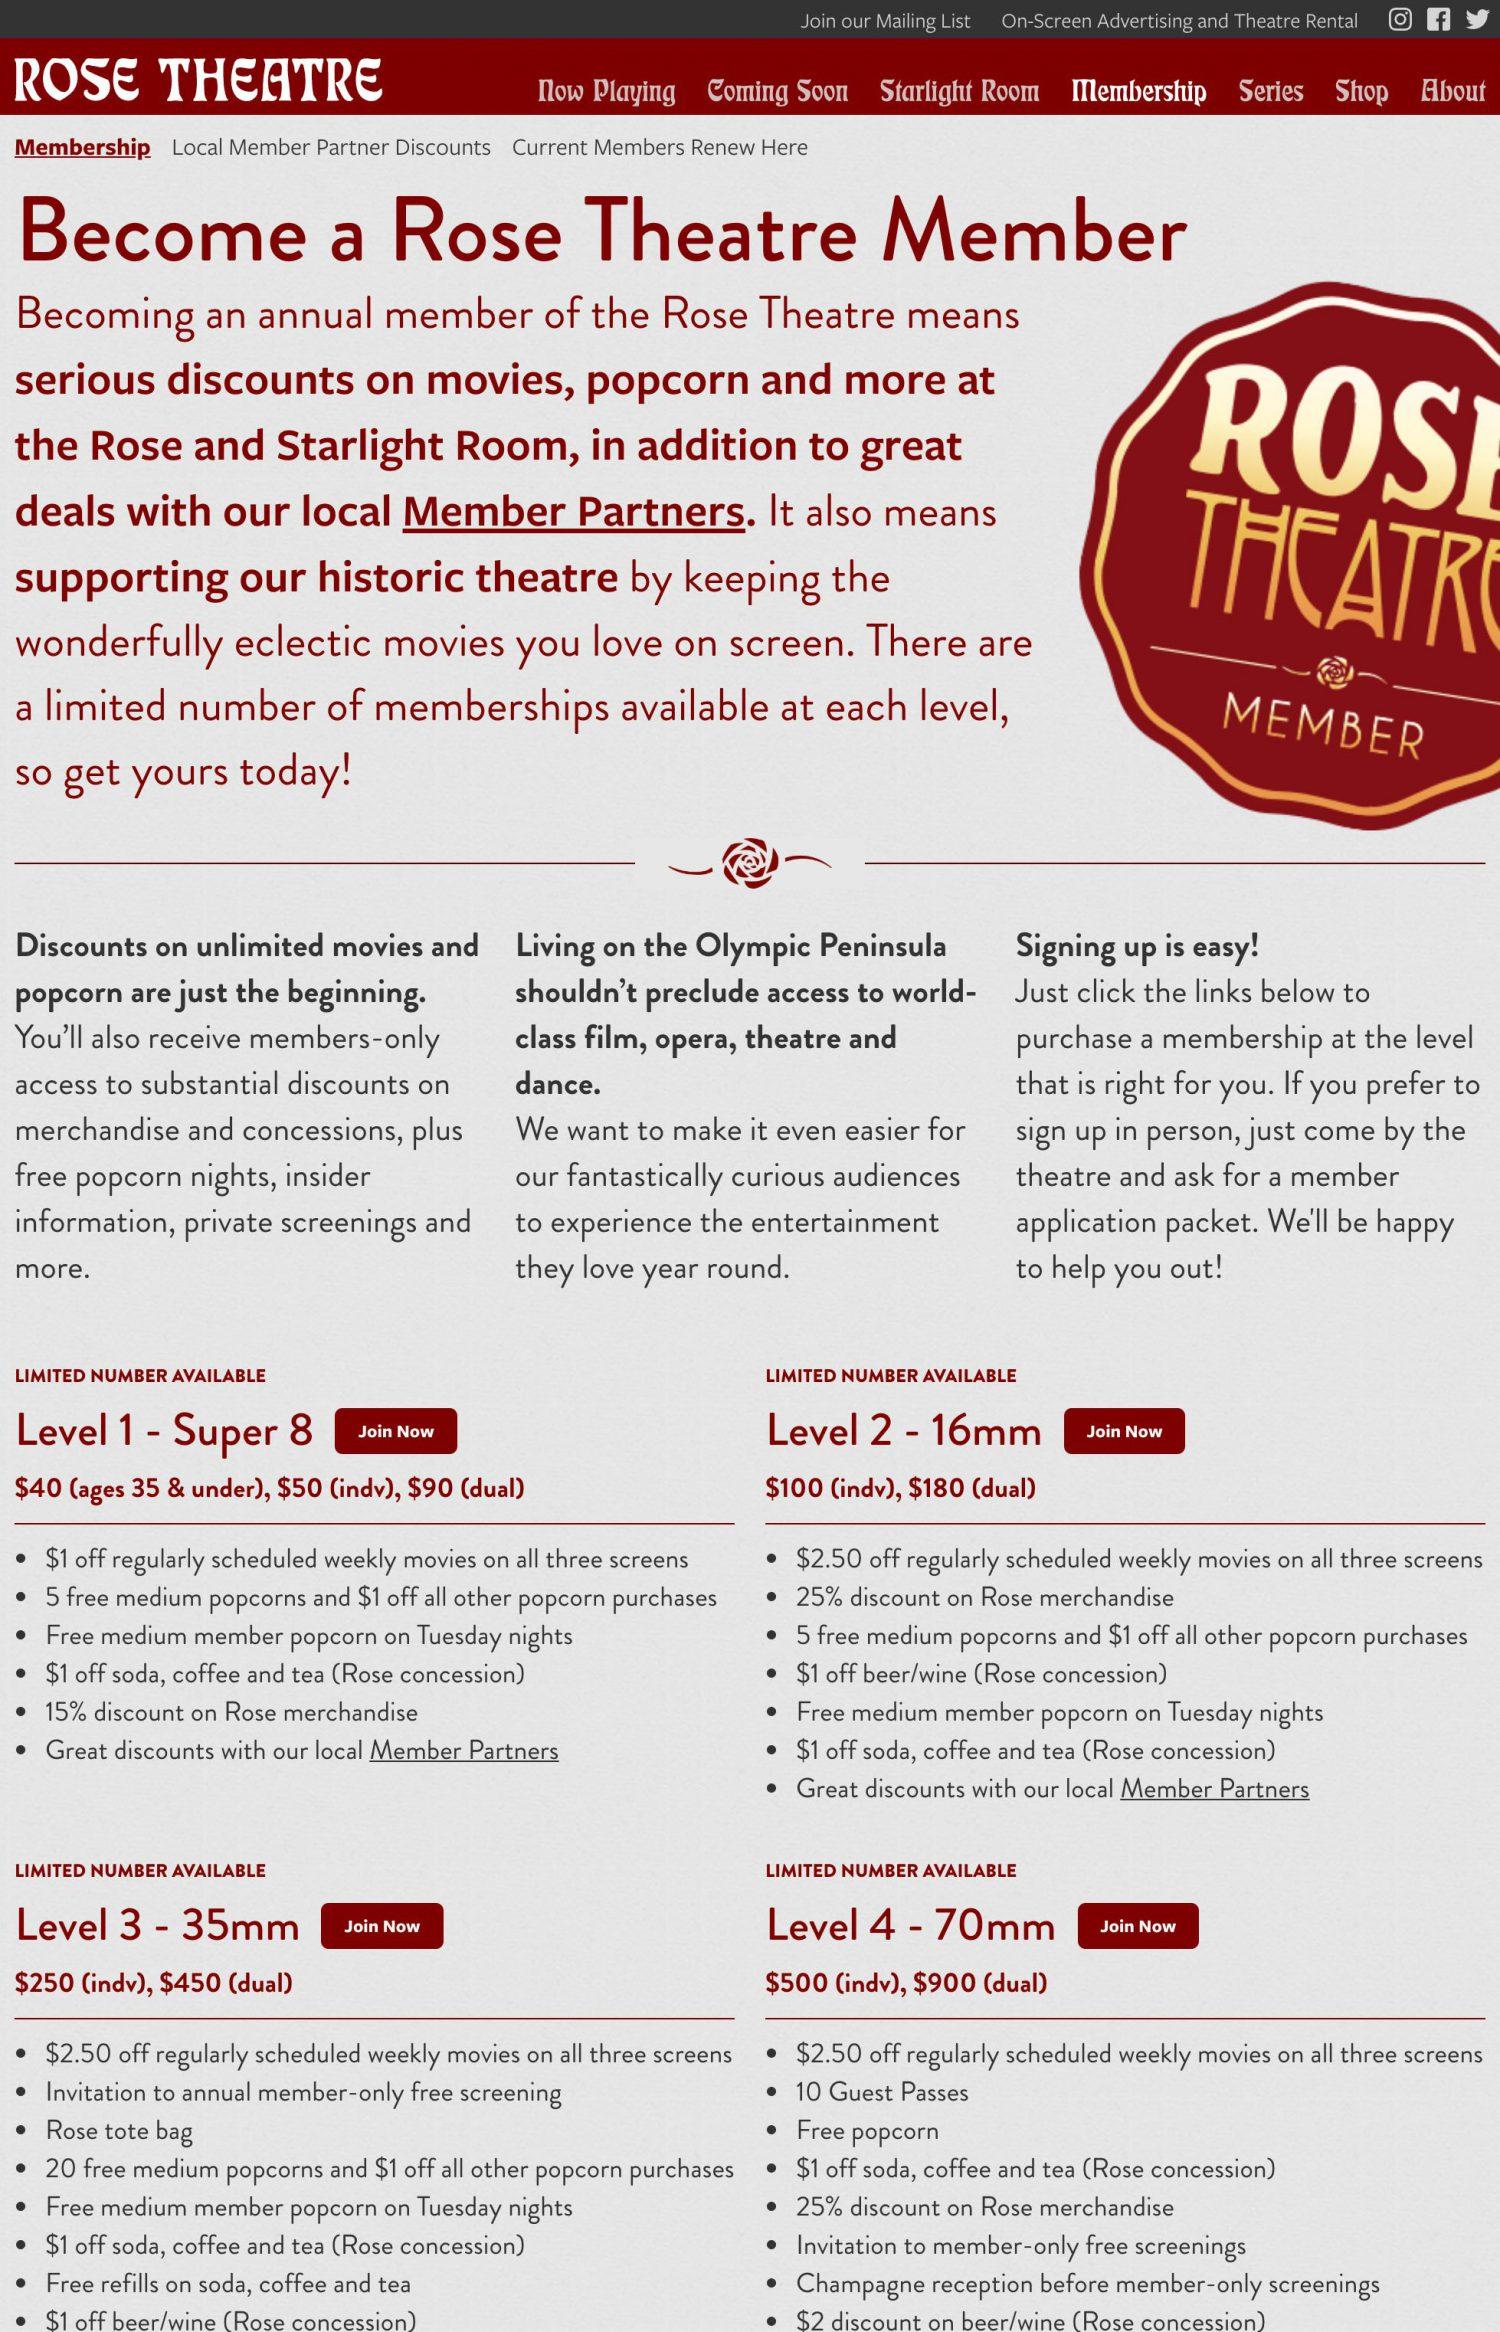 Screenshot of the Rose Theatre website's Membership landing page